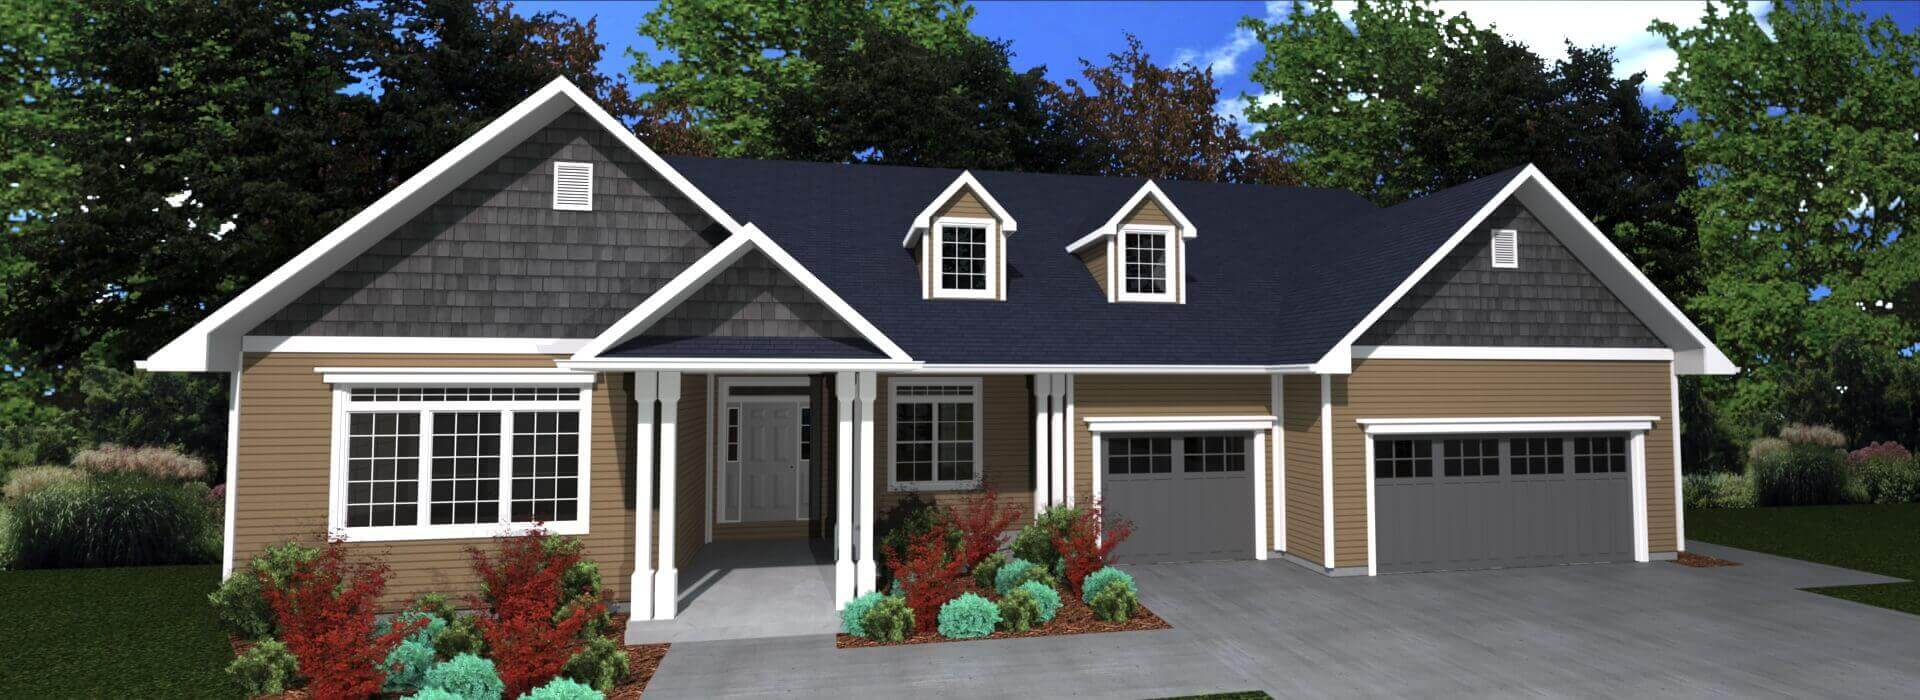 2651 house elevation